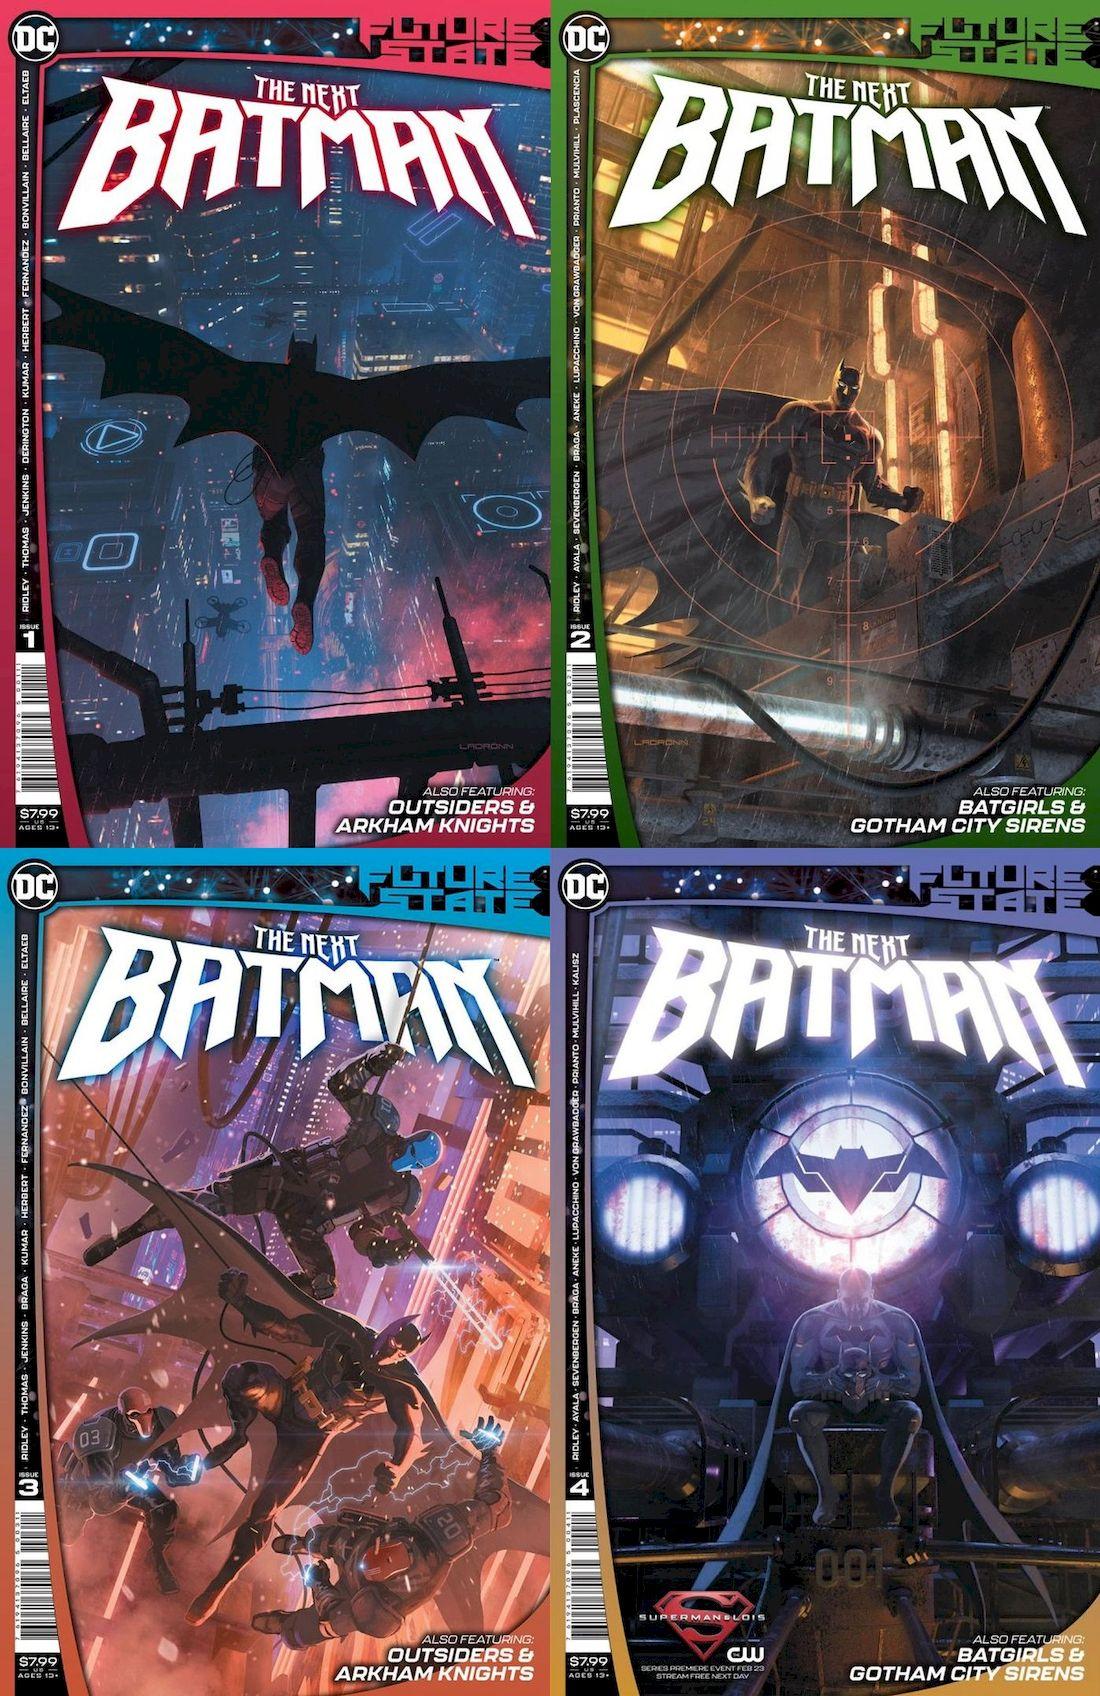 FUTURE STATE THE NEXT BATMAN #1 - #4 (OF 4) SET